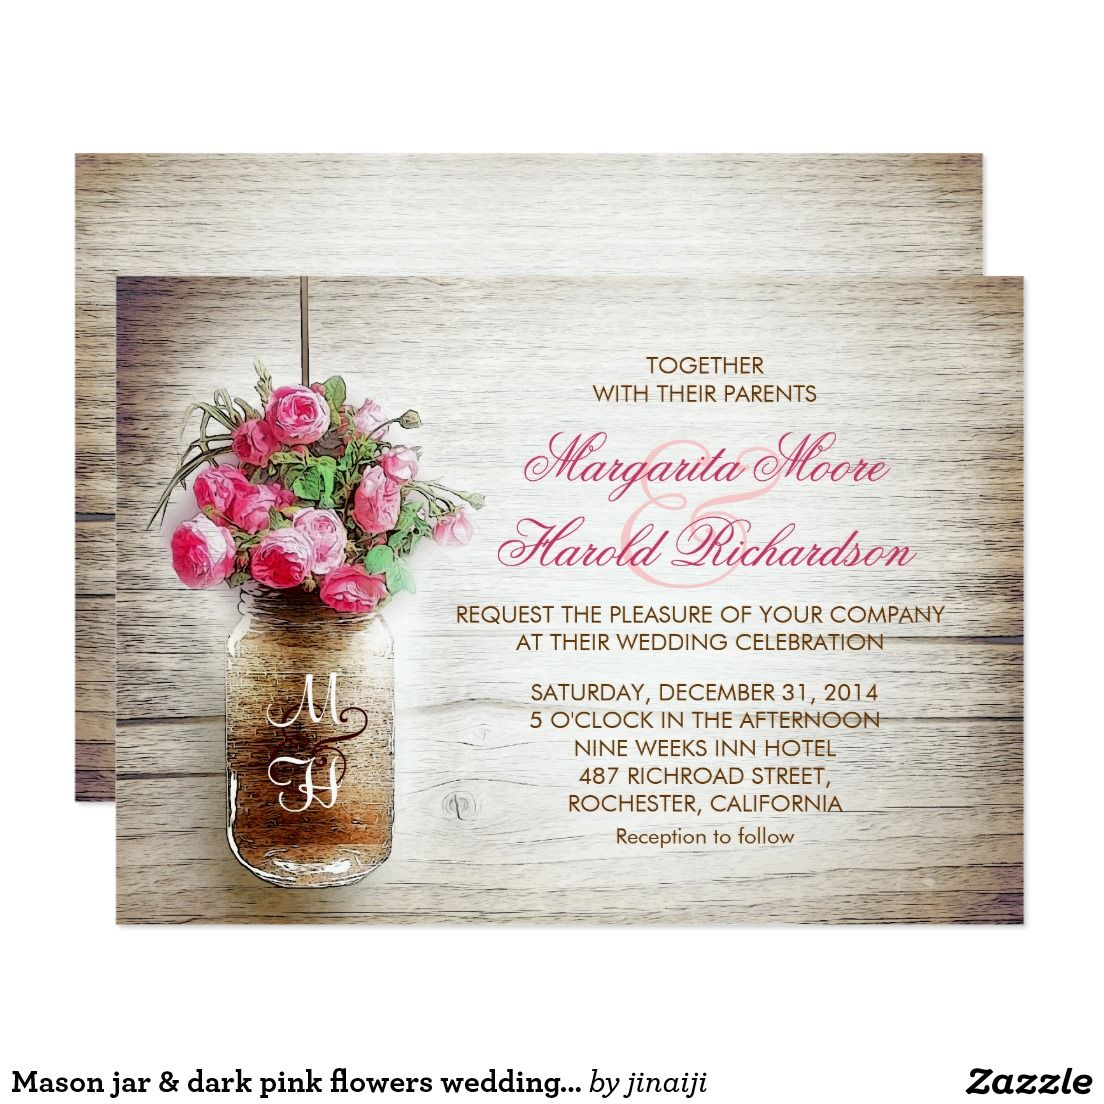 Mason jar & dark pink flowers wedding invites | Pink, Jars and Pink ...